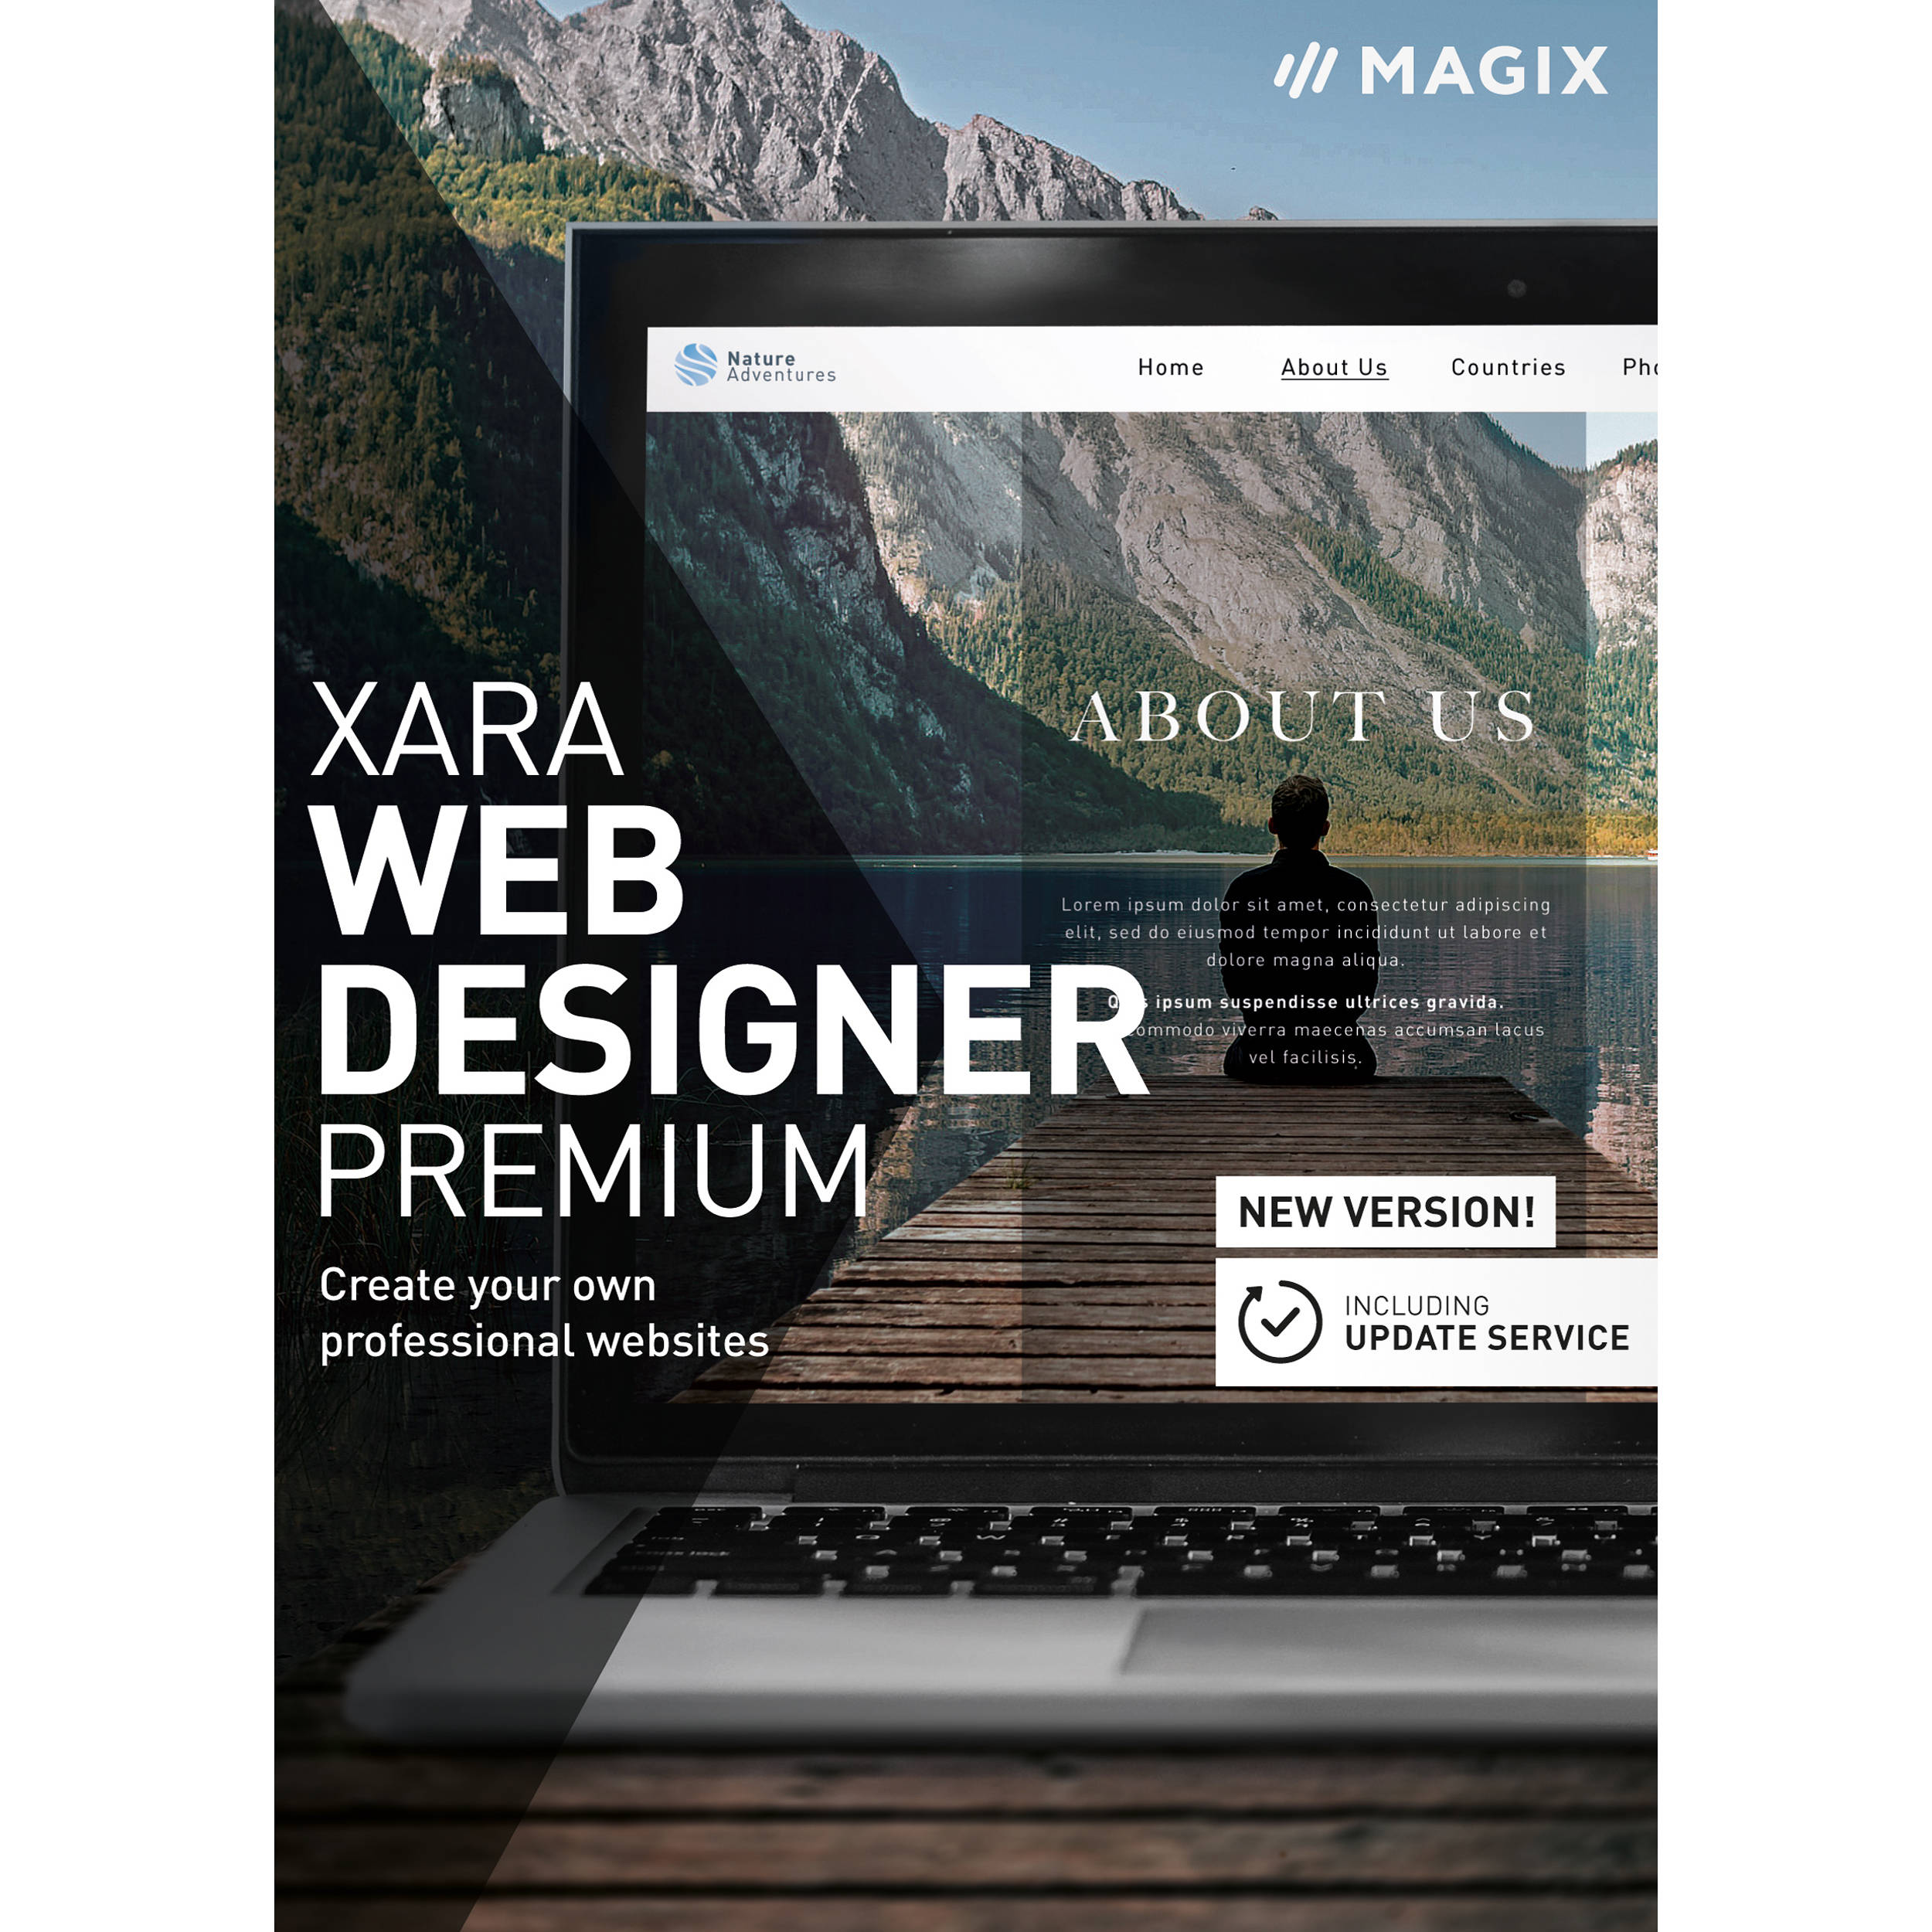 Magix Xara Web Designer 17 Premium Software Esd Anr009824esd